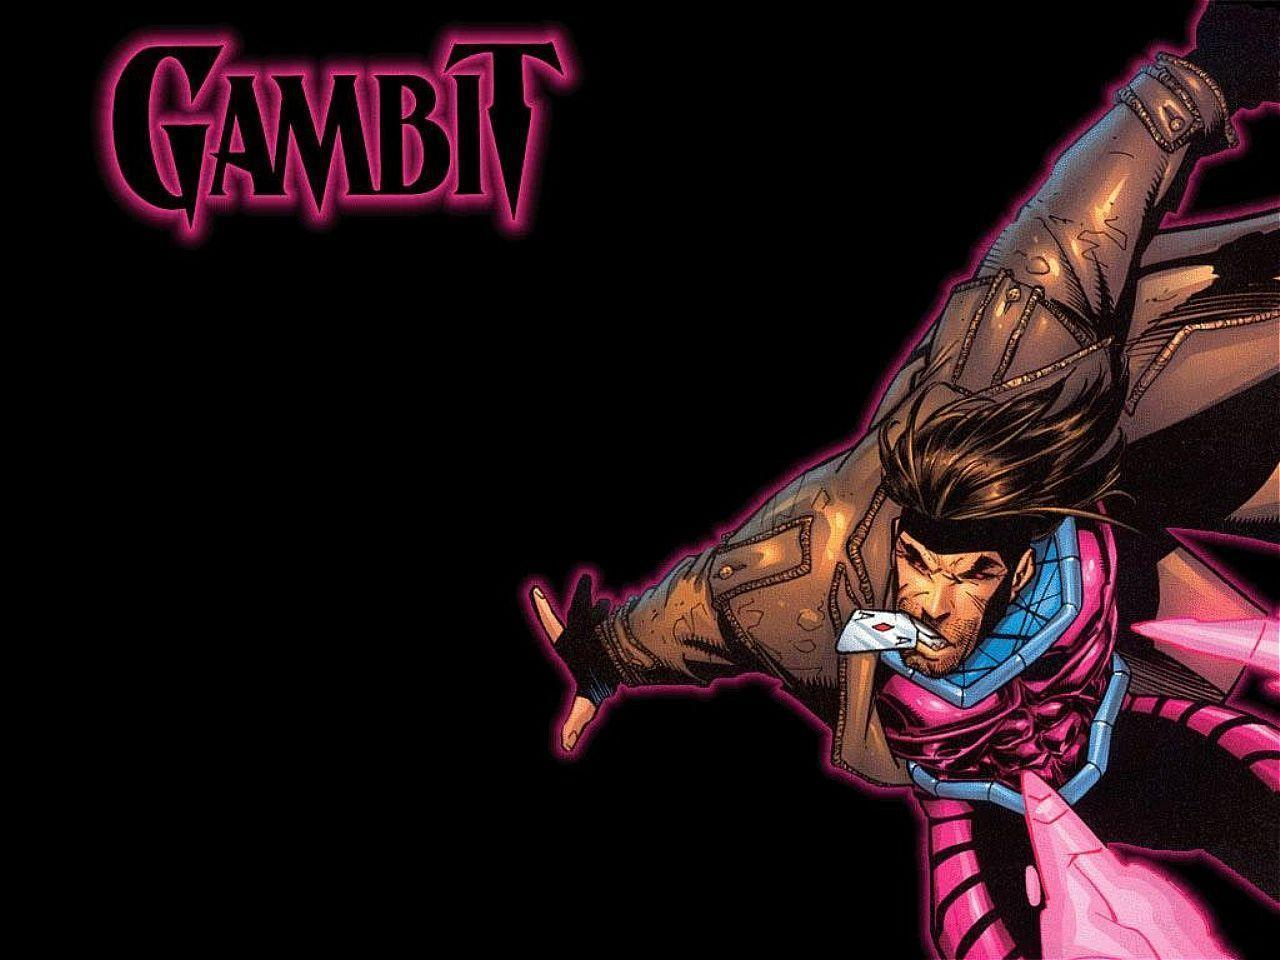 gambit guardians wallpaper 1920x1080 - photo #4